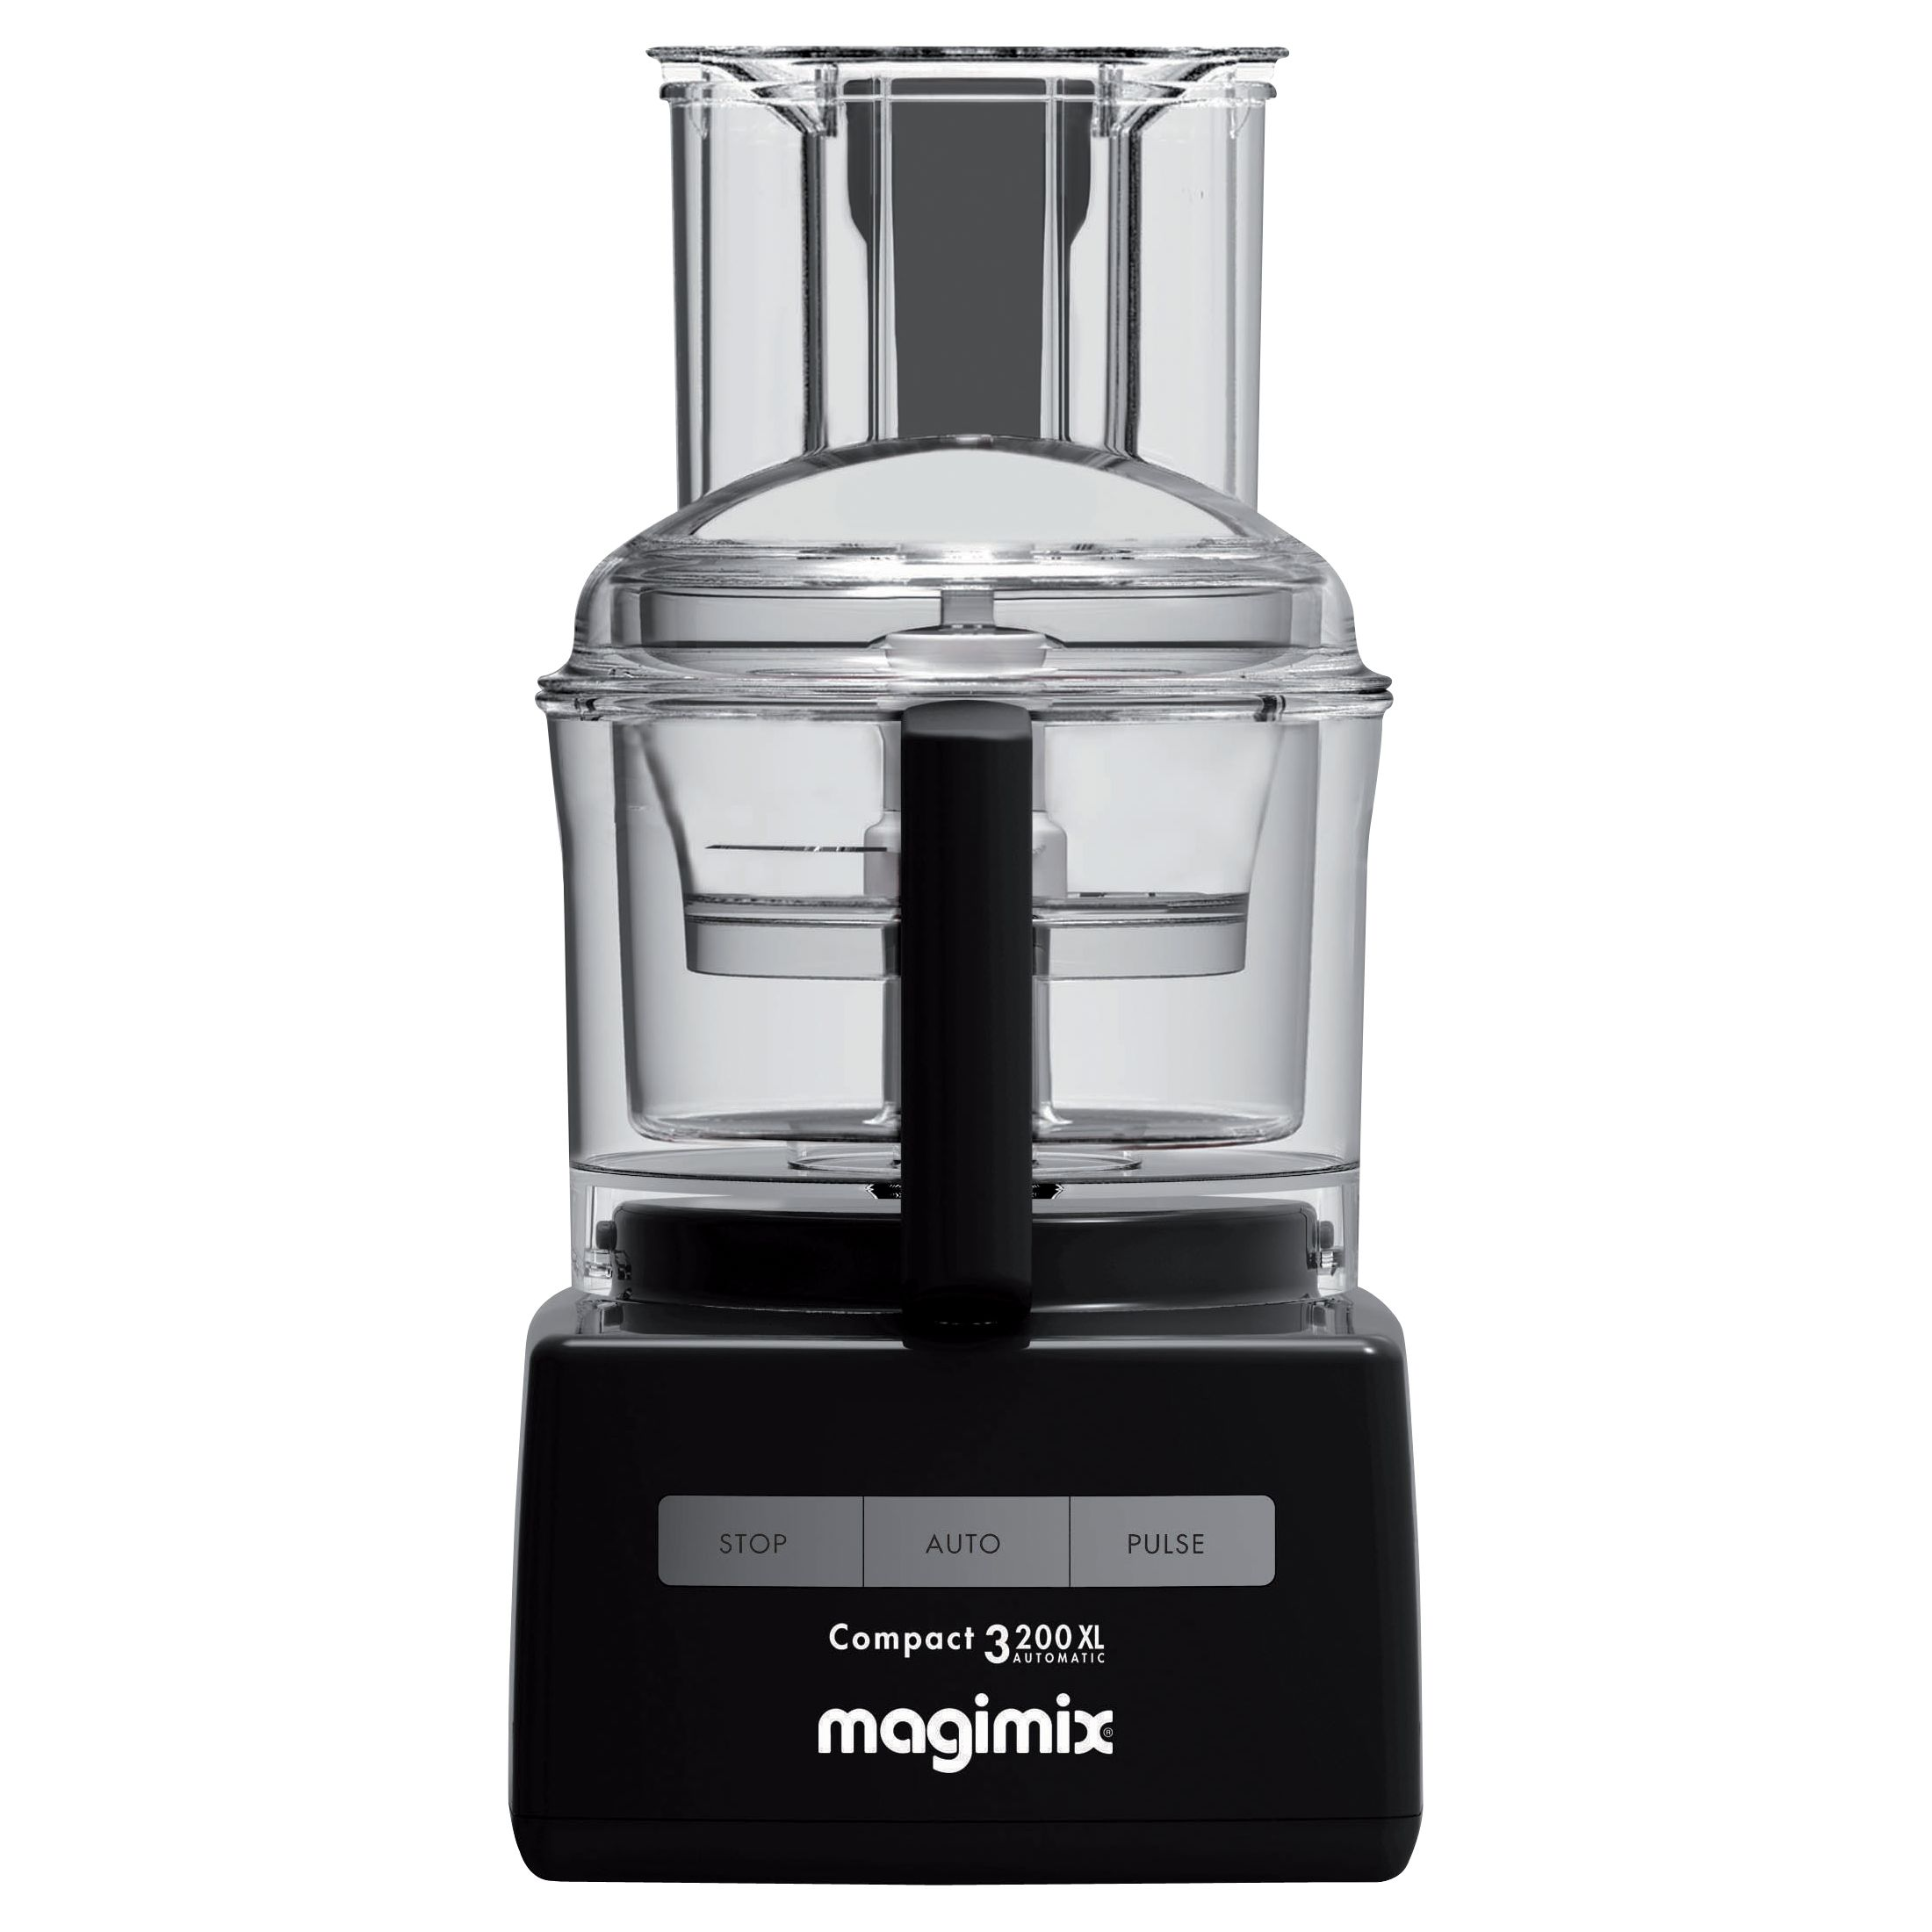 top 10 cheapest magimix food processor 3200 prices best uk deals on food processors. Black Bedroom Furniture Sets. Home Design Ideas